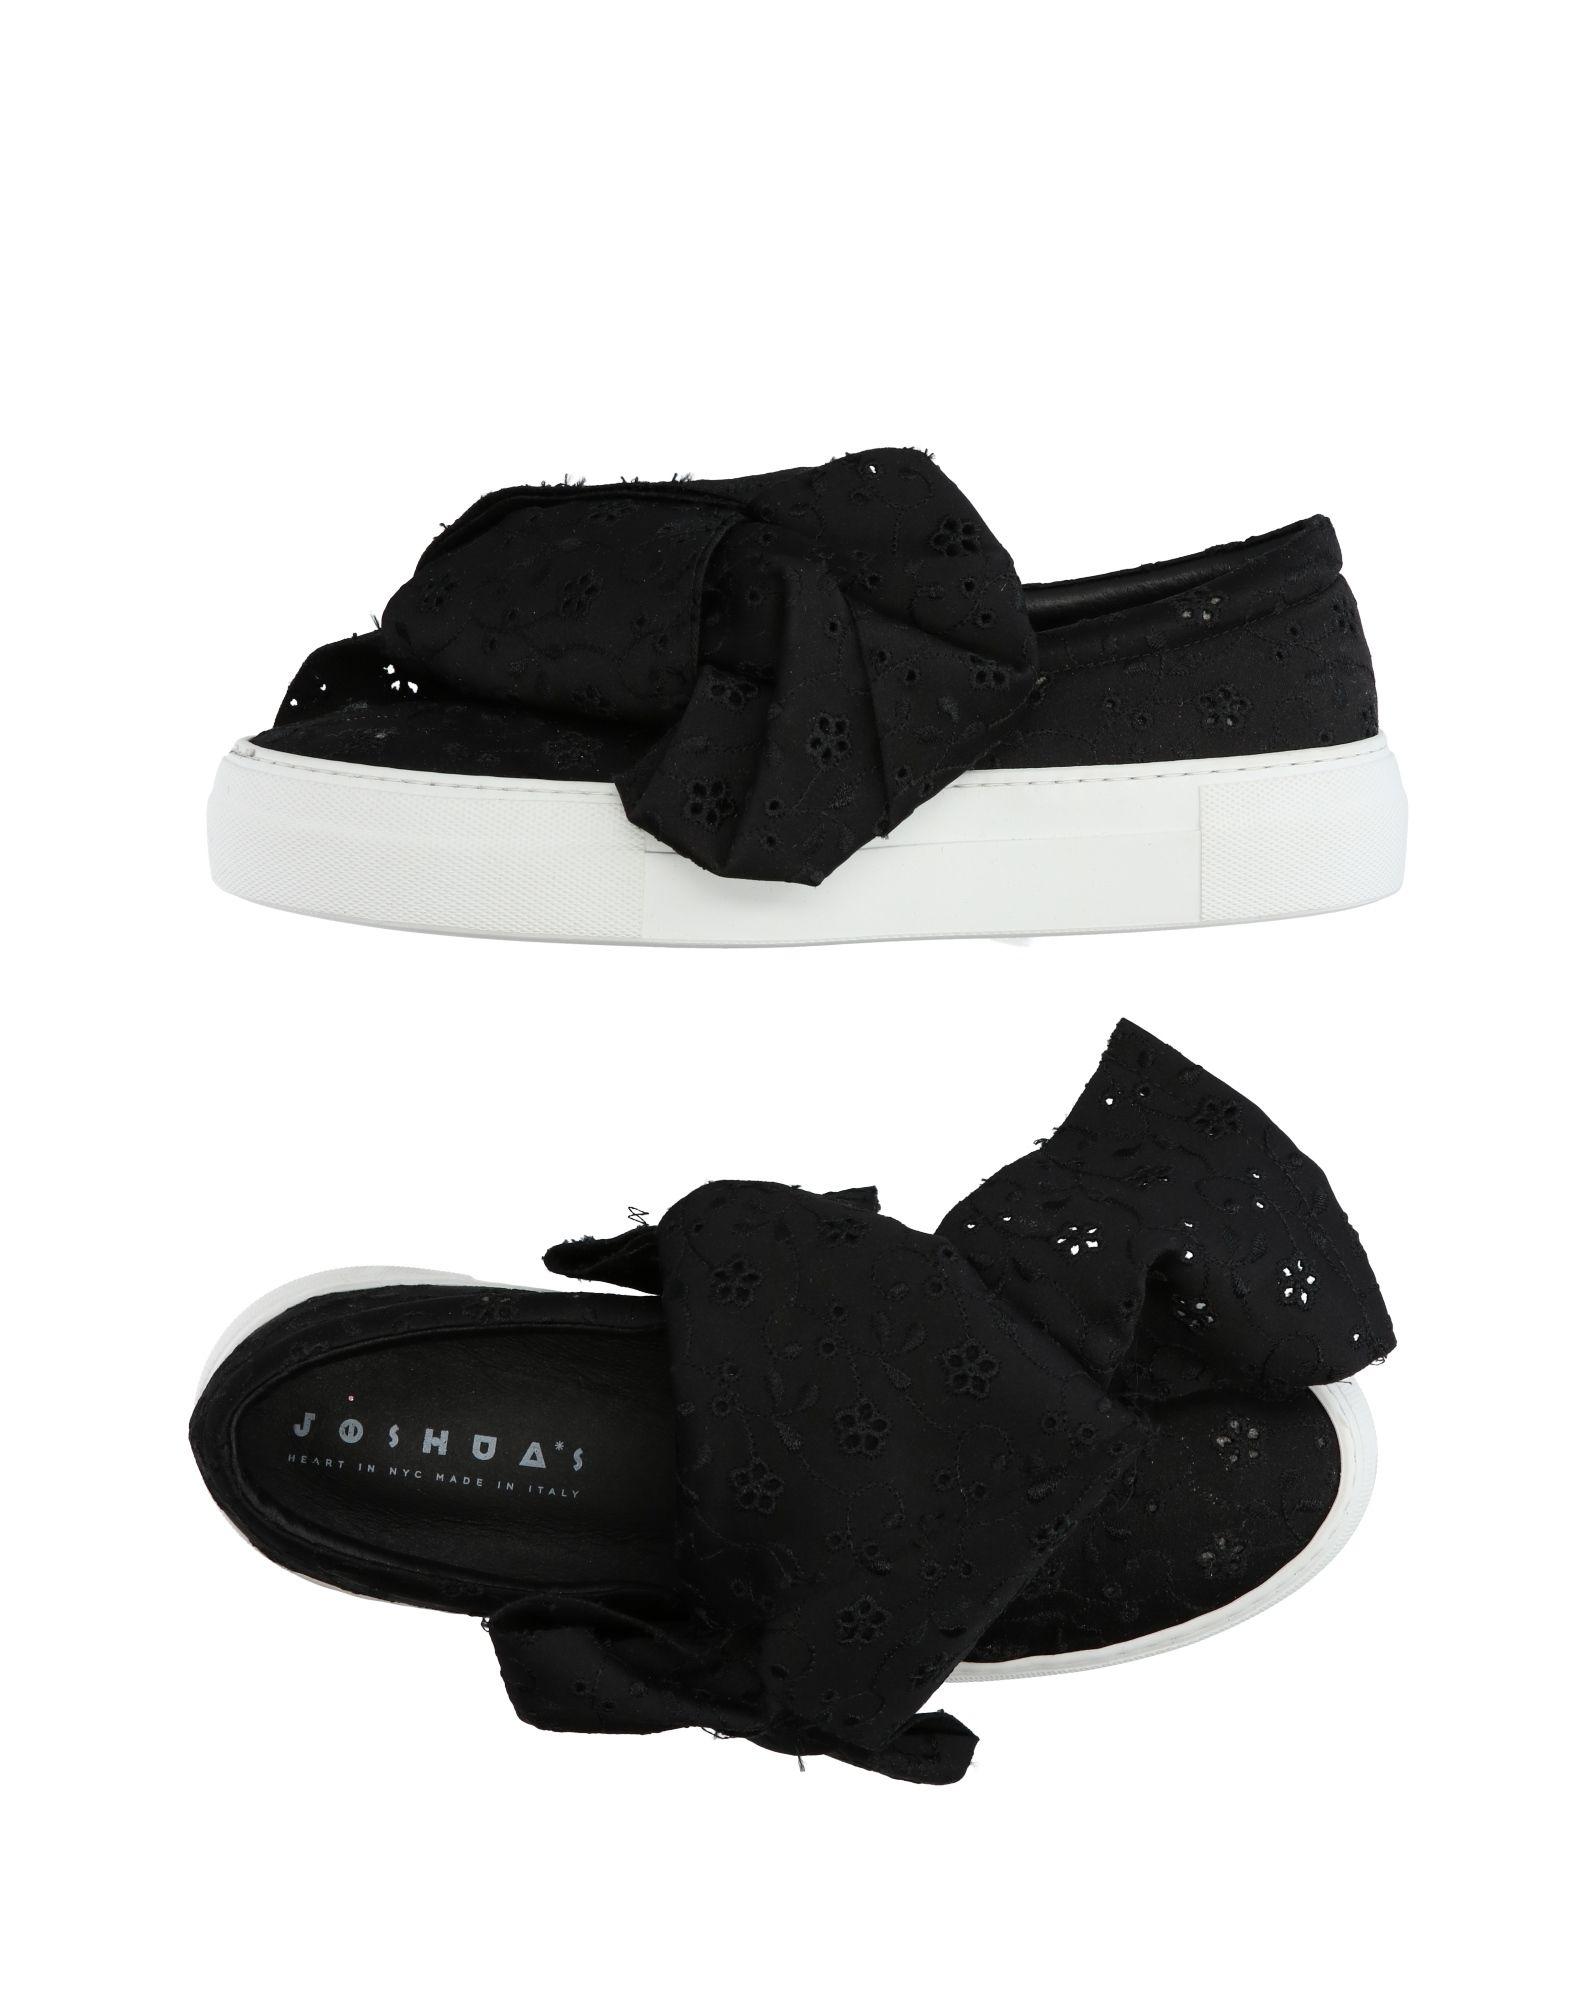 Joshua*S Sneakers Damen  11254932FMGut aussehende strapazierfähige Schuhe